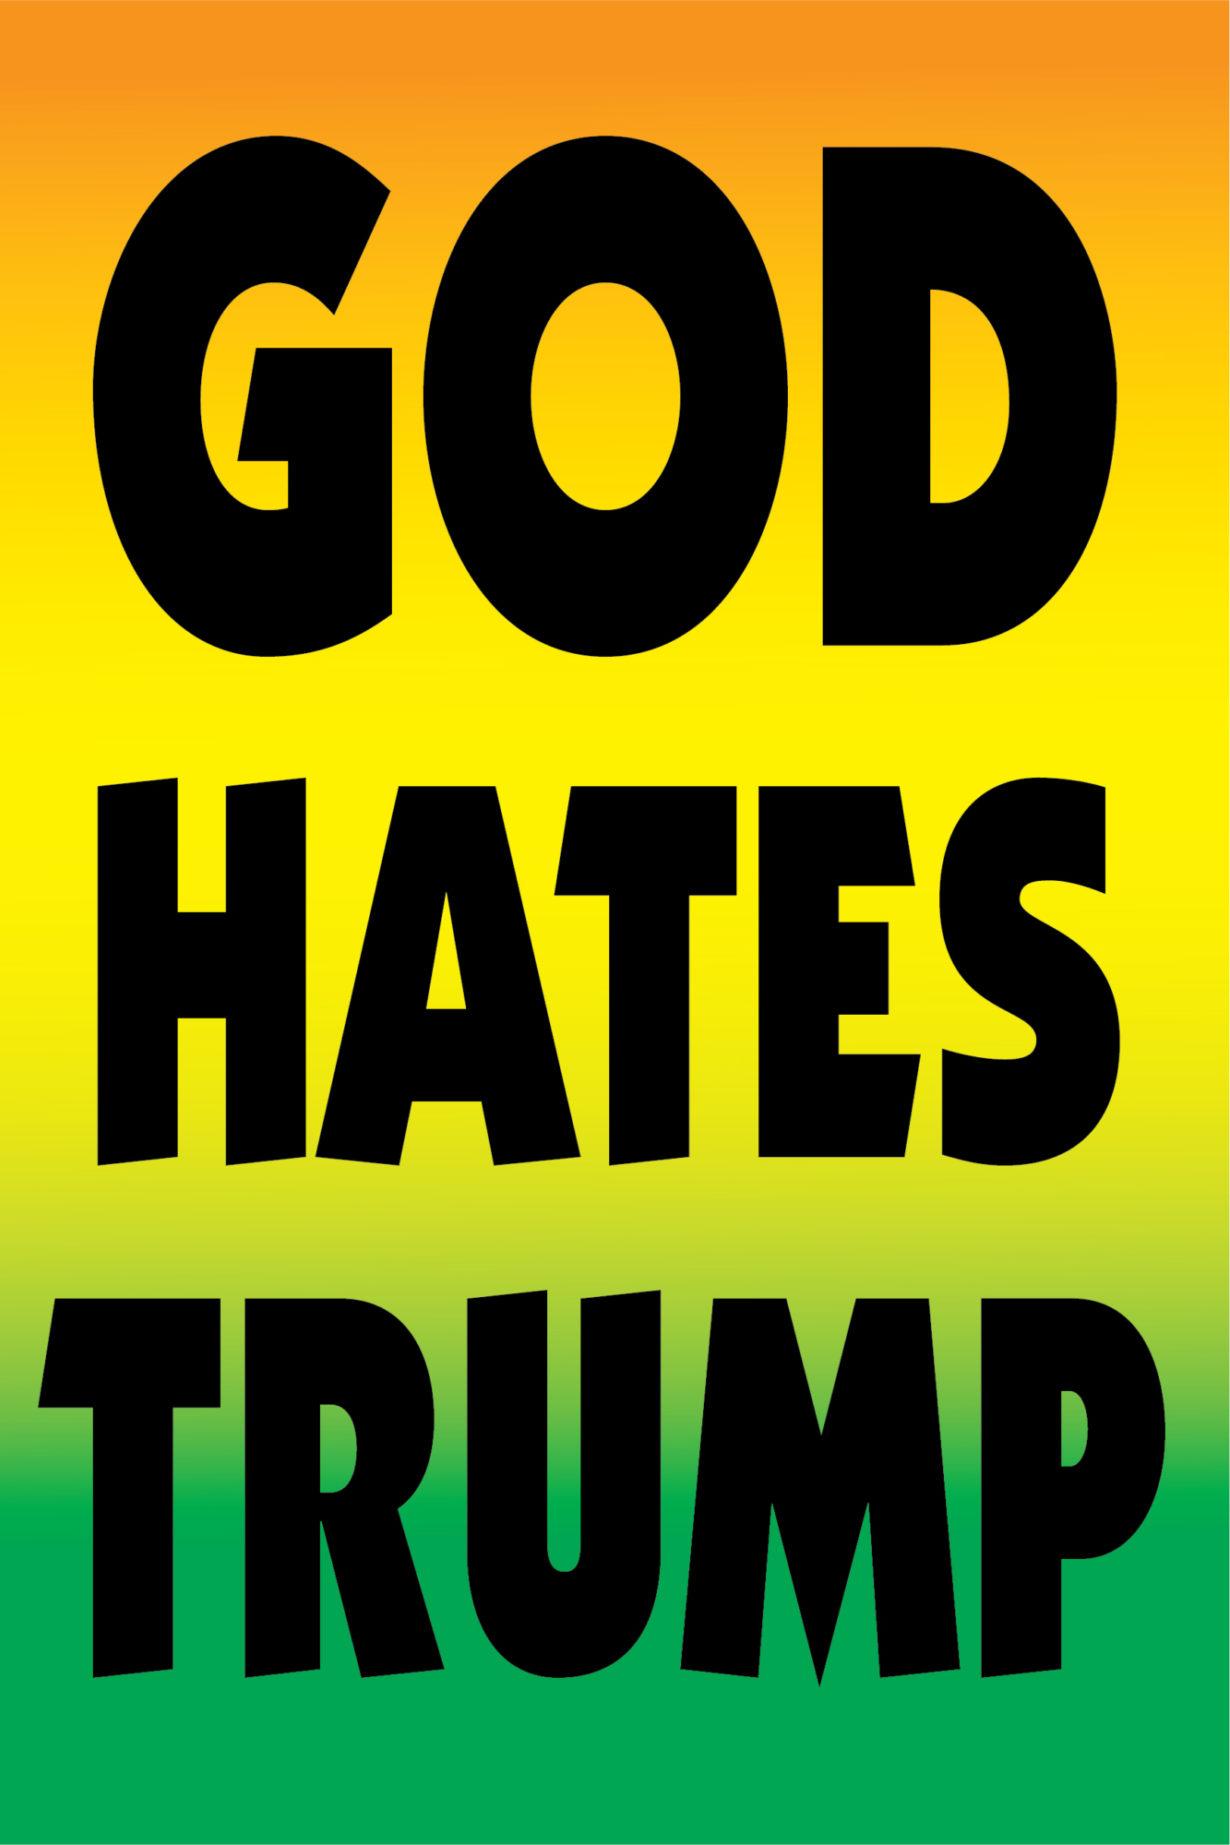 NP_01_25_2017_God-Hates-Trump.jpg